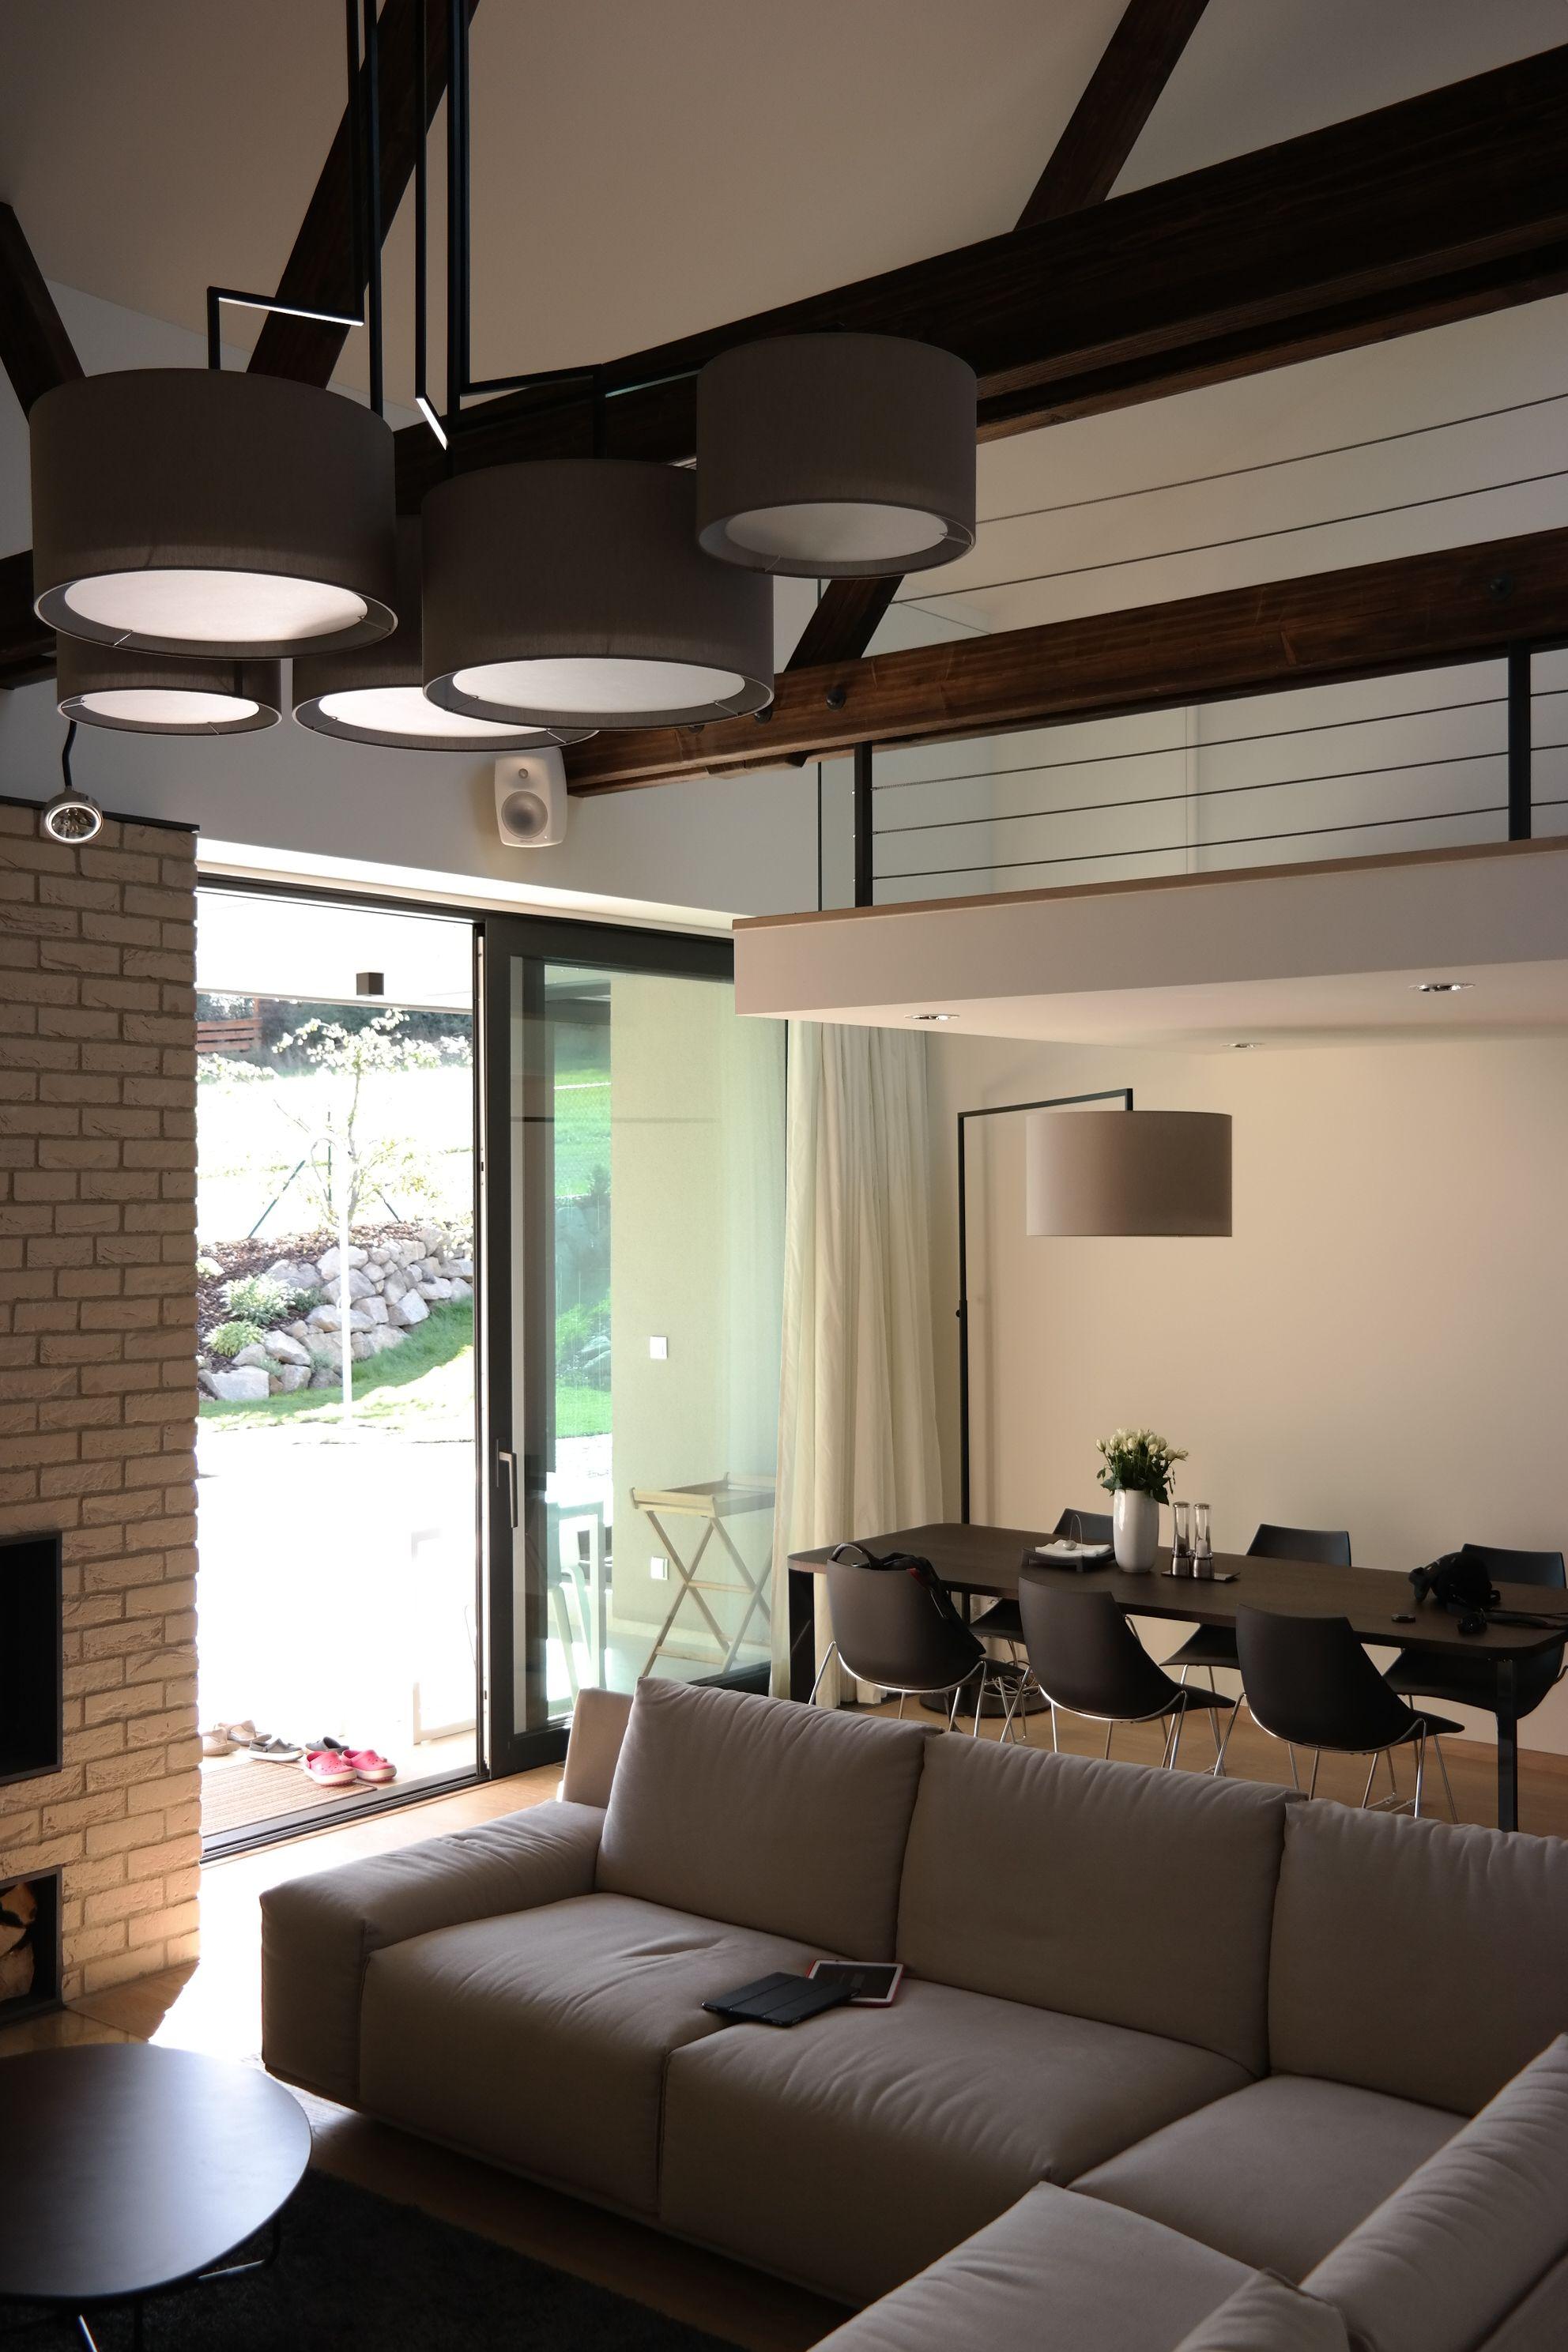 Loreta homes pysely bungalow sydney interior living room - Free interior design ideas for living rooms ...